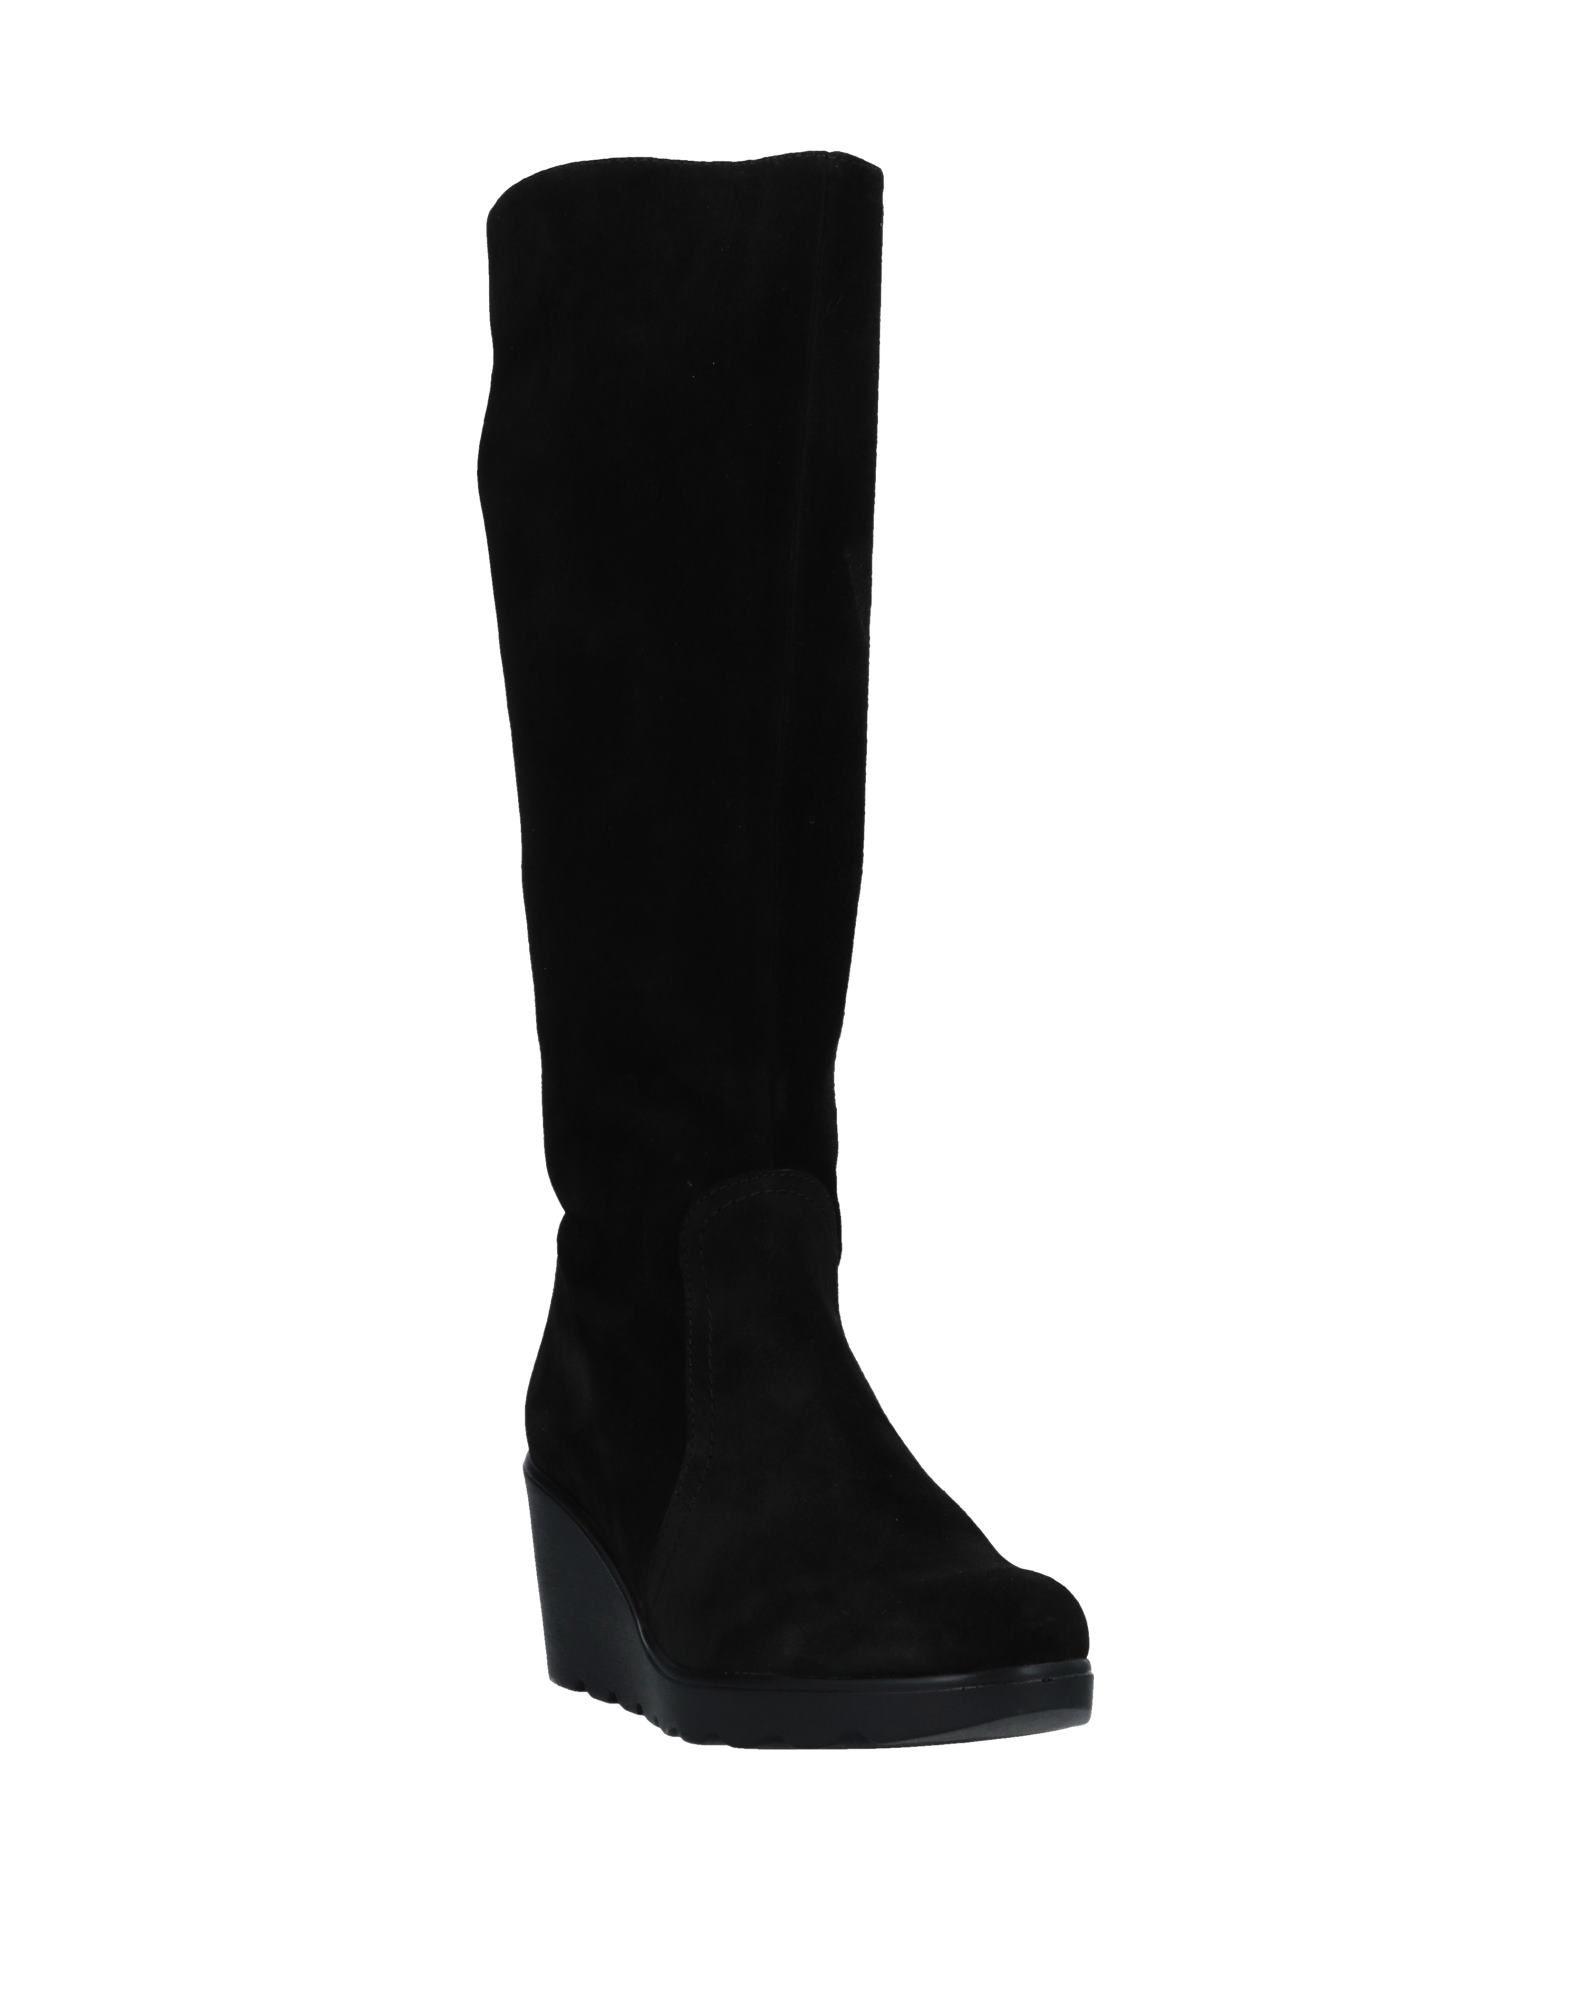 Toni Pons Stiefel Damen  11520600IC 11520600IC 11520600IC Gute Qualität beliebte Schuhe 7b7576